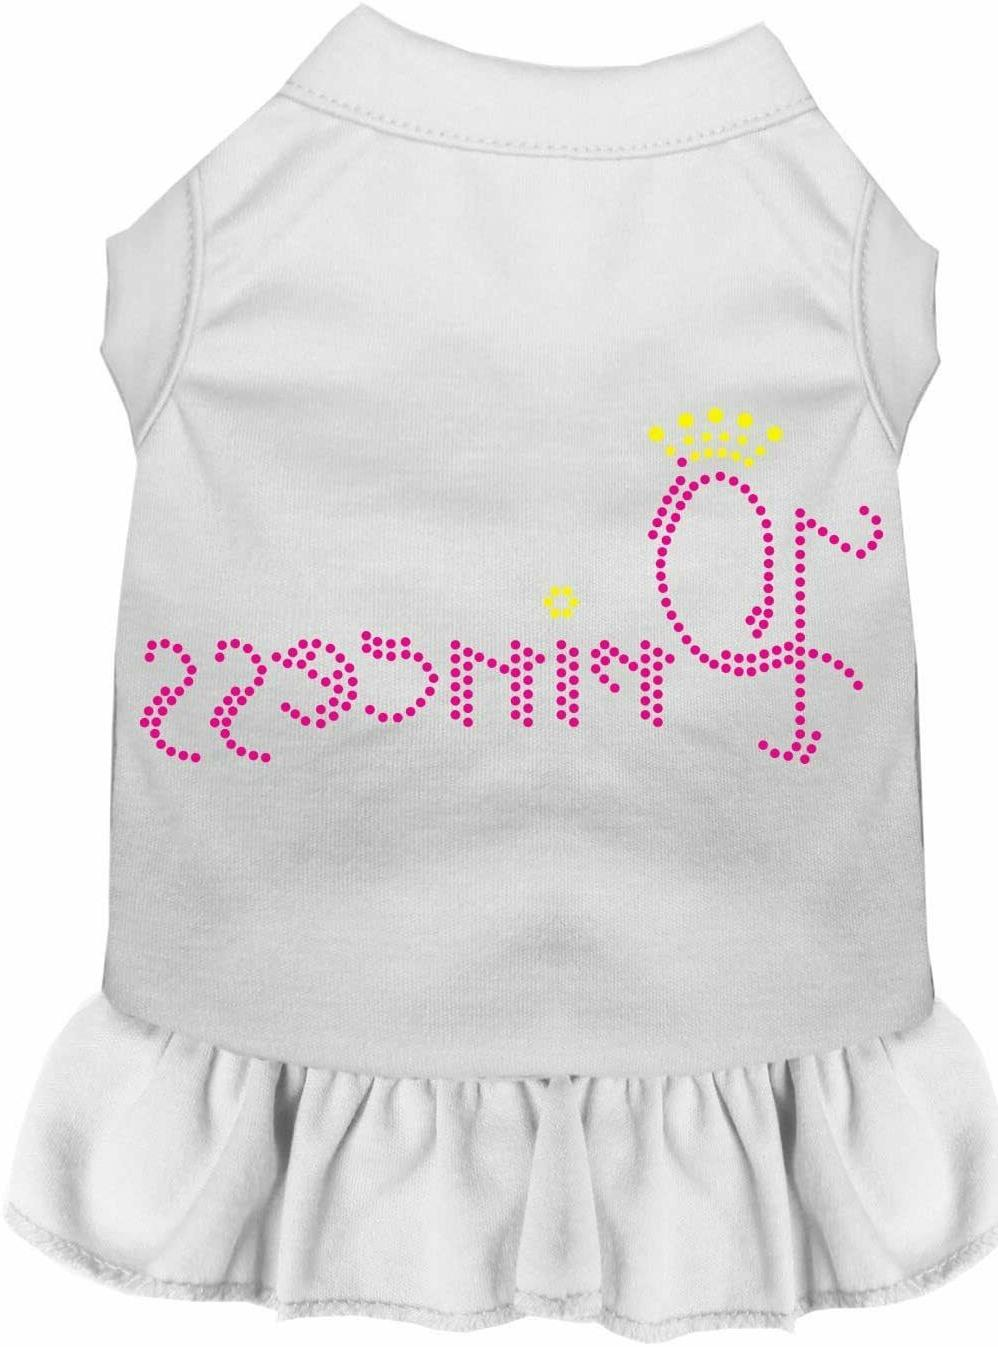 Princess Dress-By Pet--Assorted